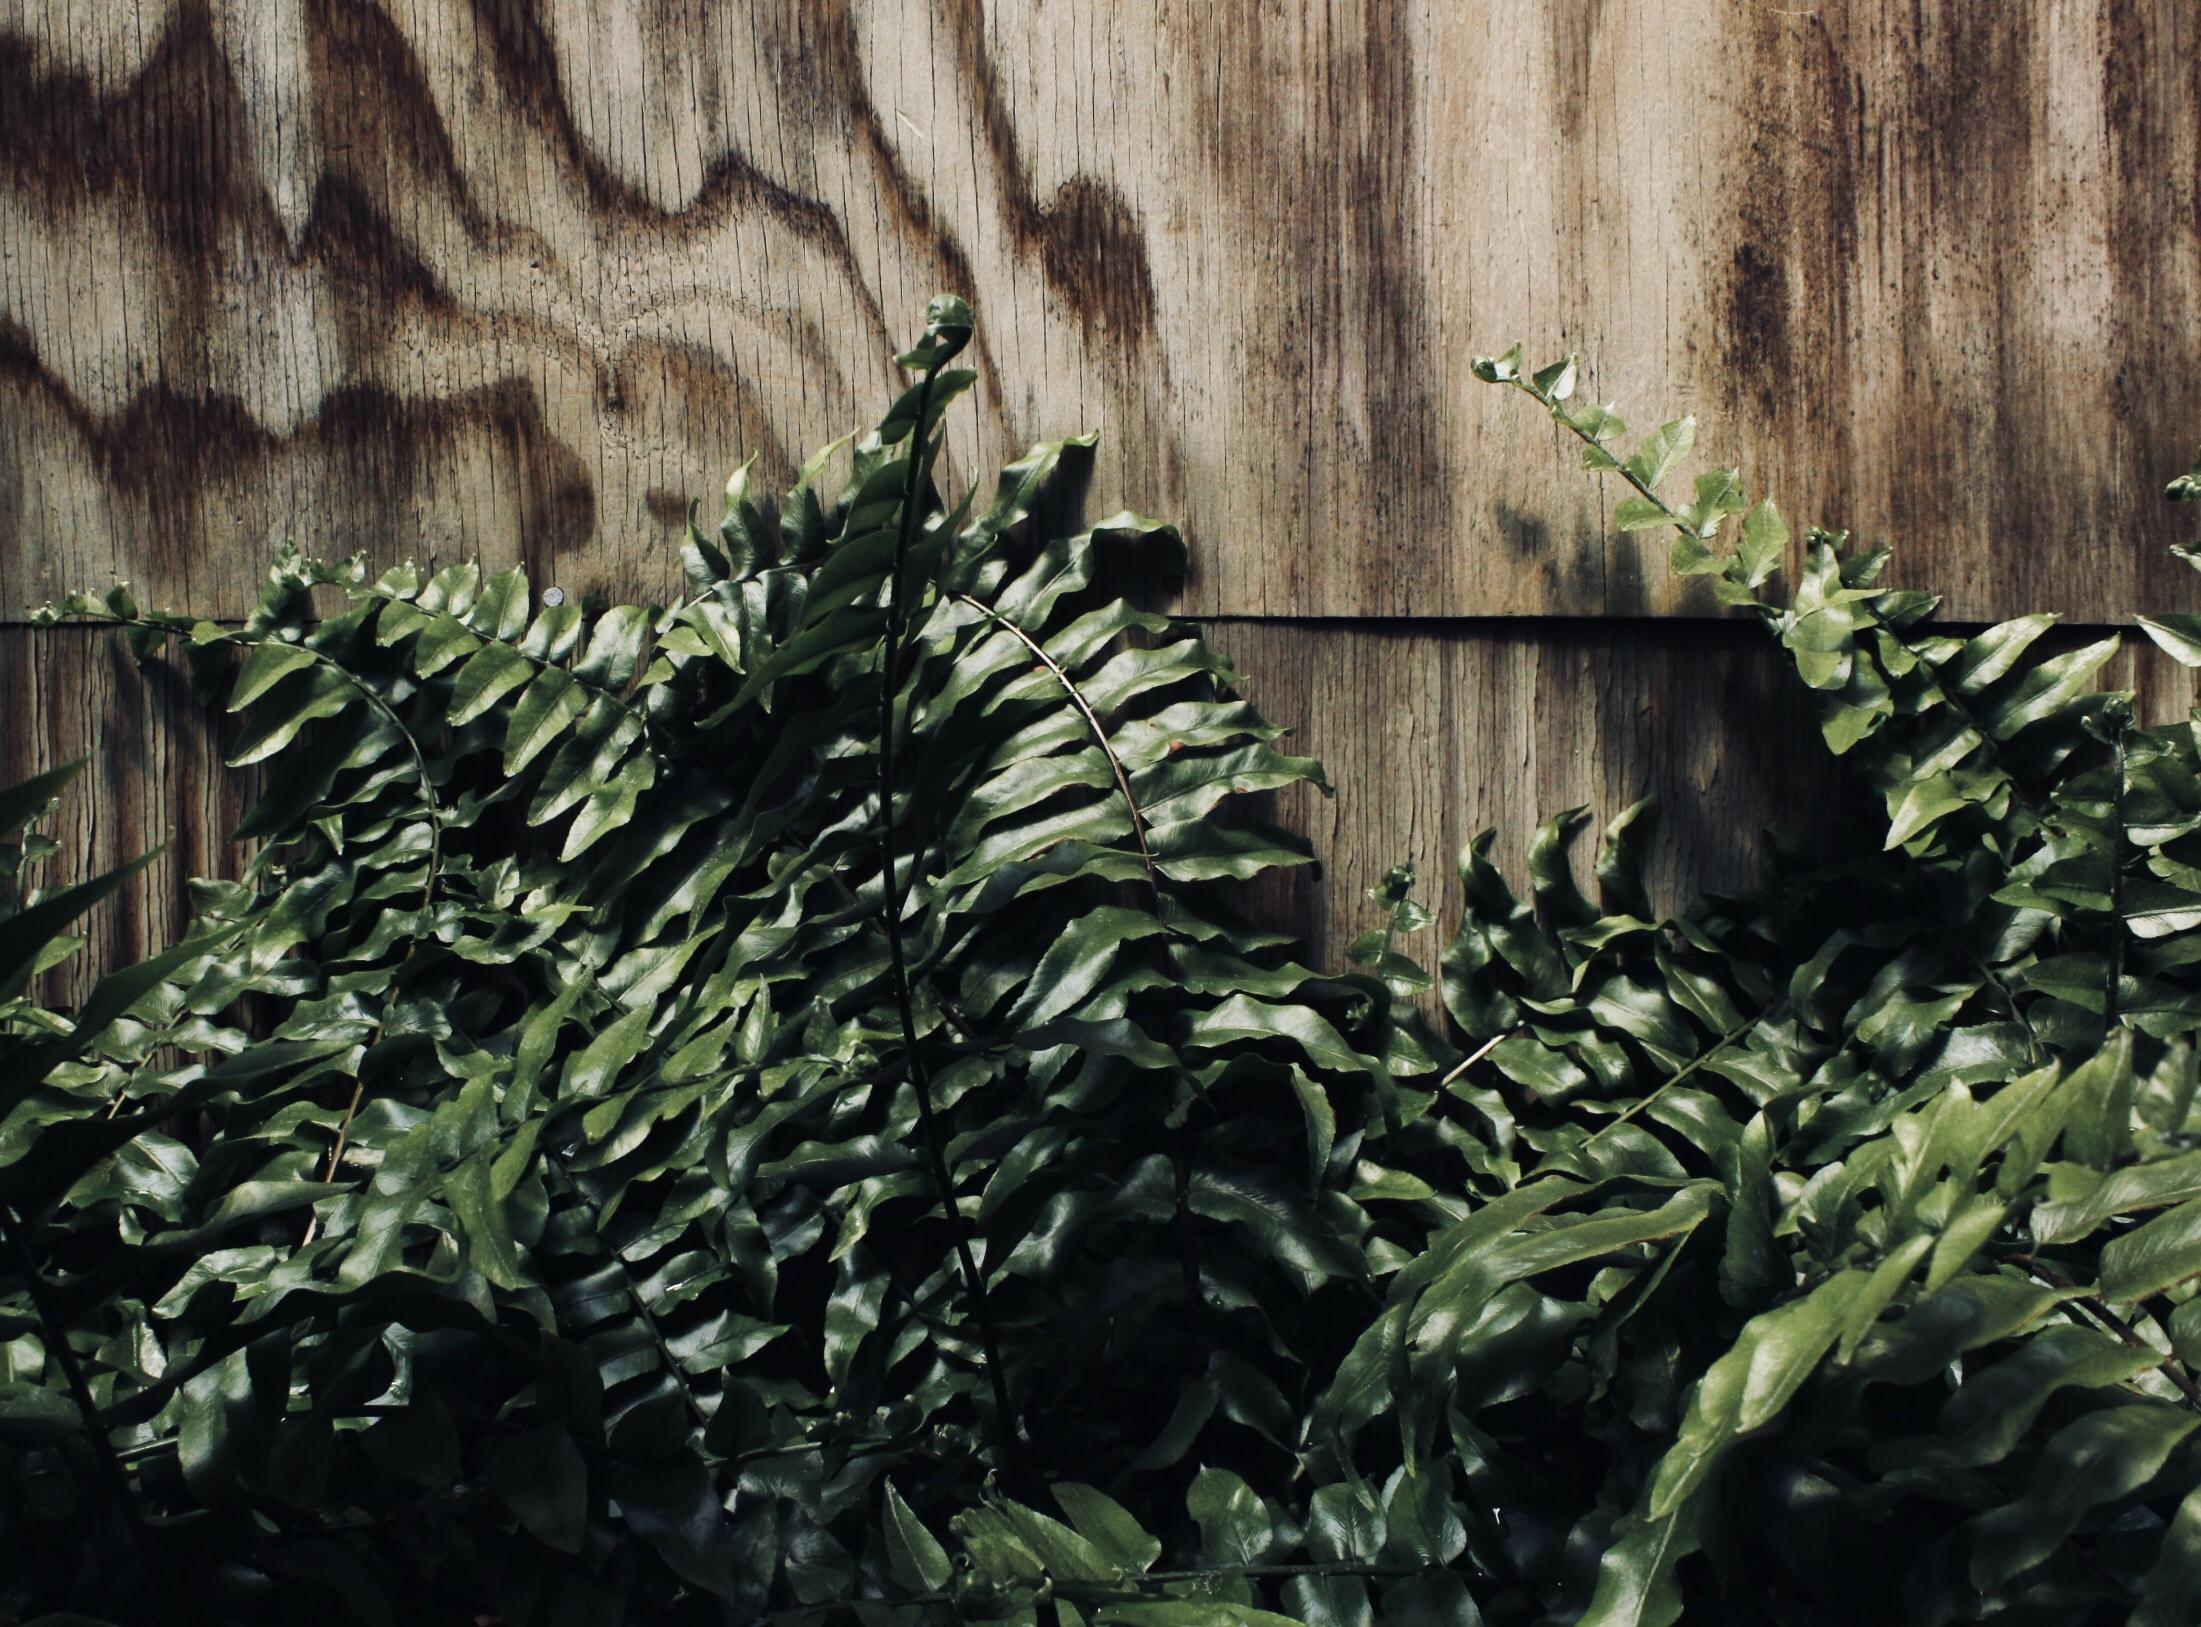 Boston fern leaf on wooden surface